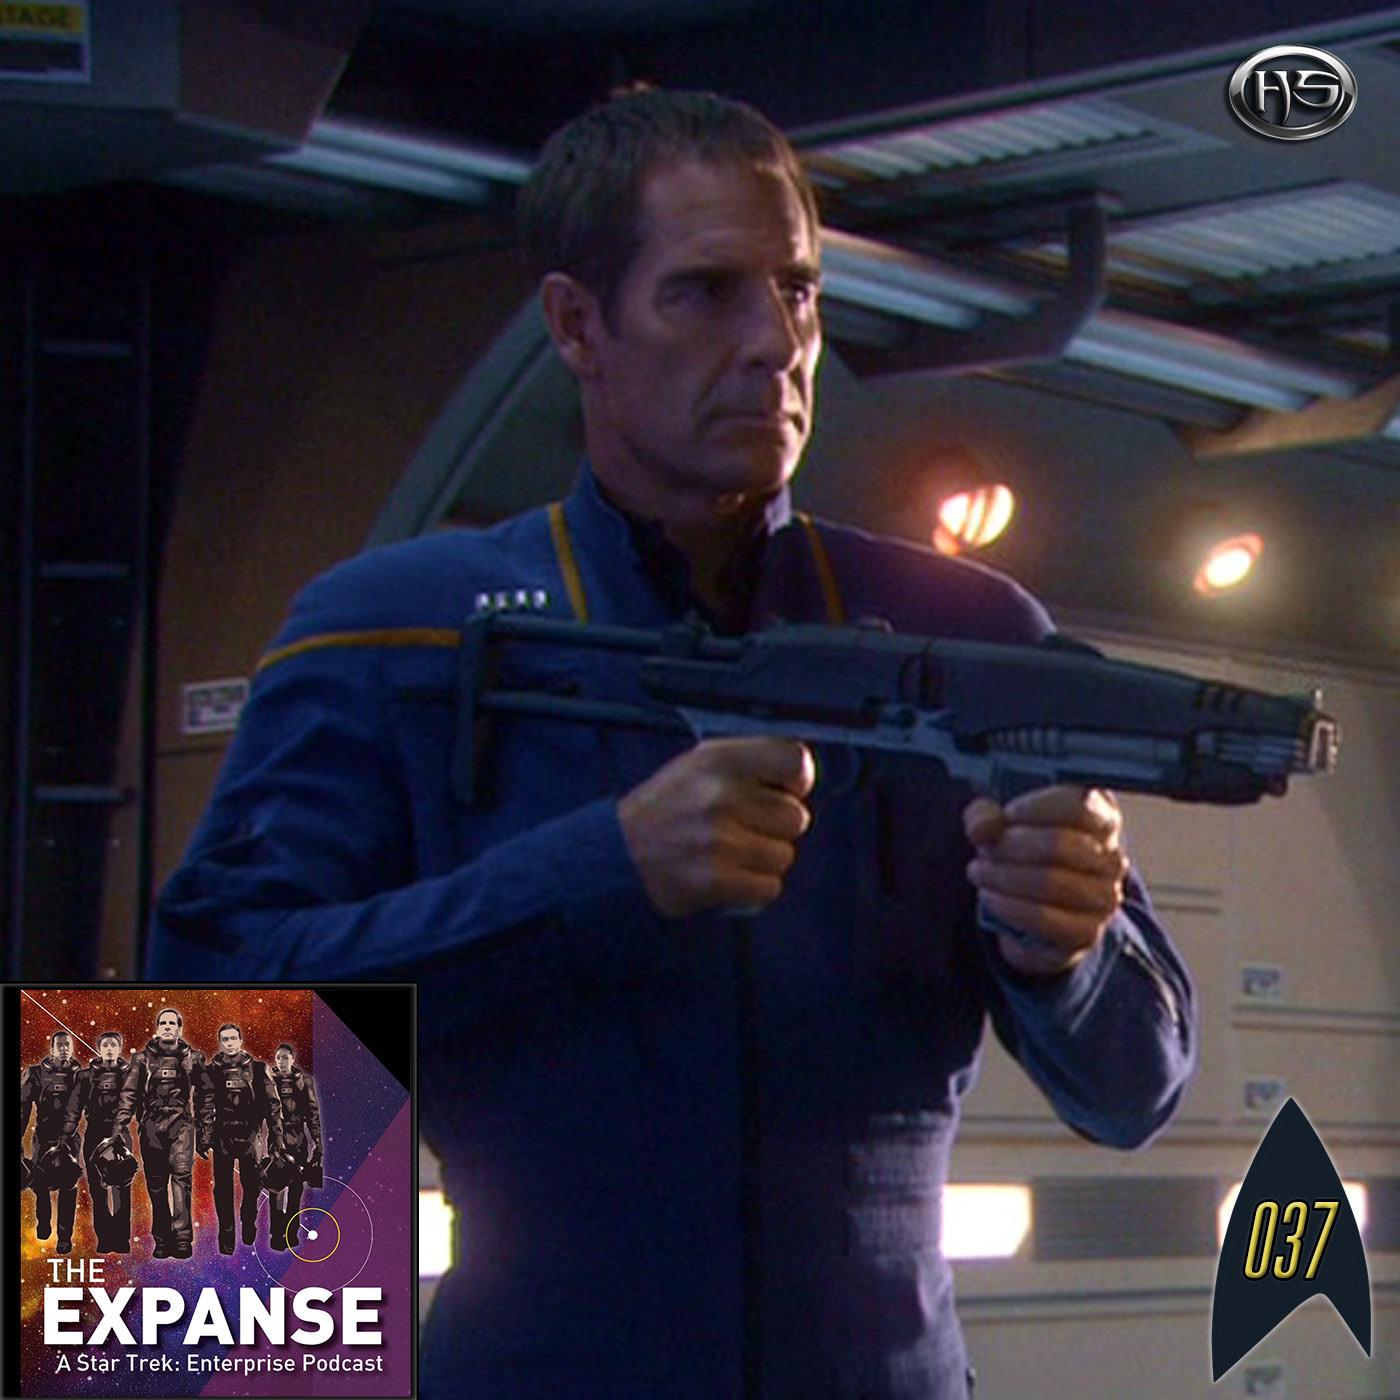 The Expanse Episode 37